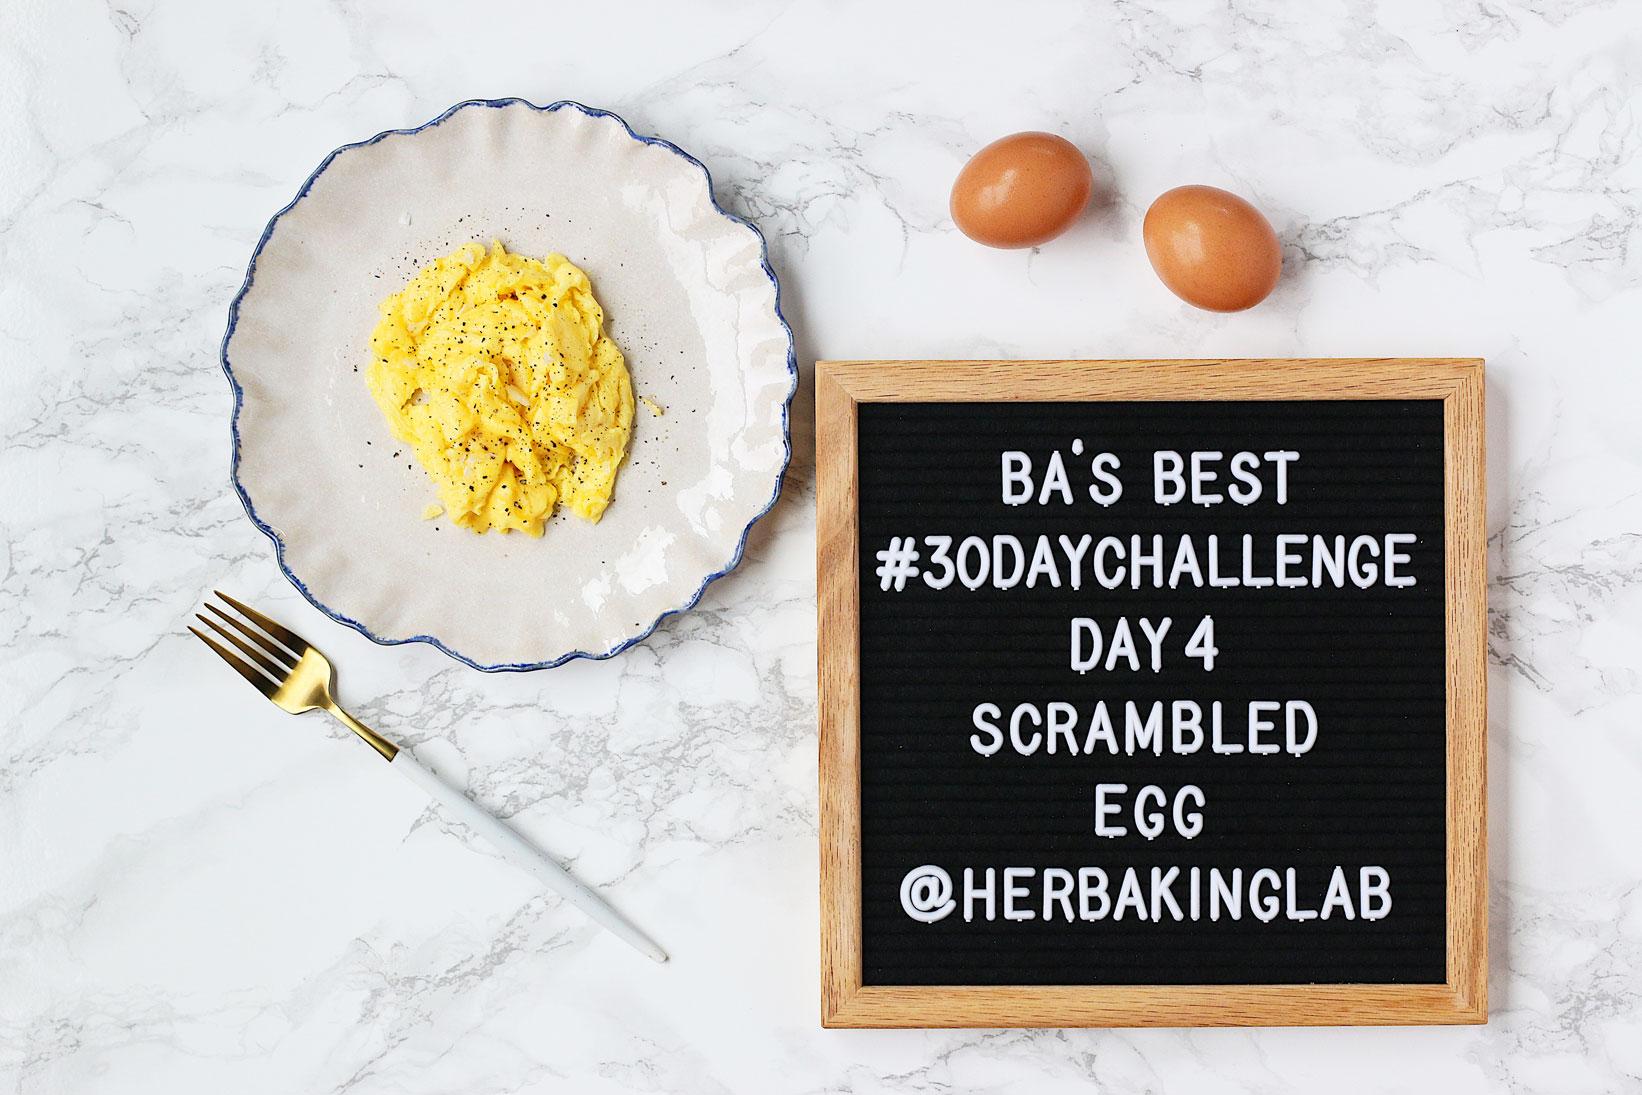 #ba30daychallenge-bon-appetit-best-recipes-day-4-scrambled-egg